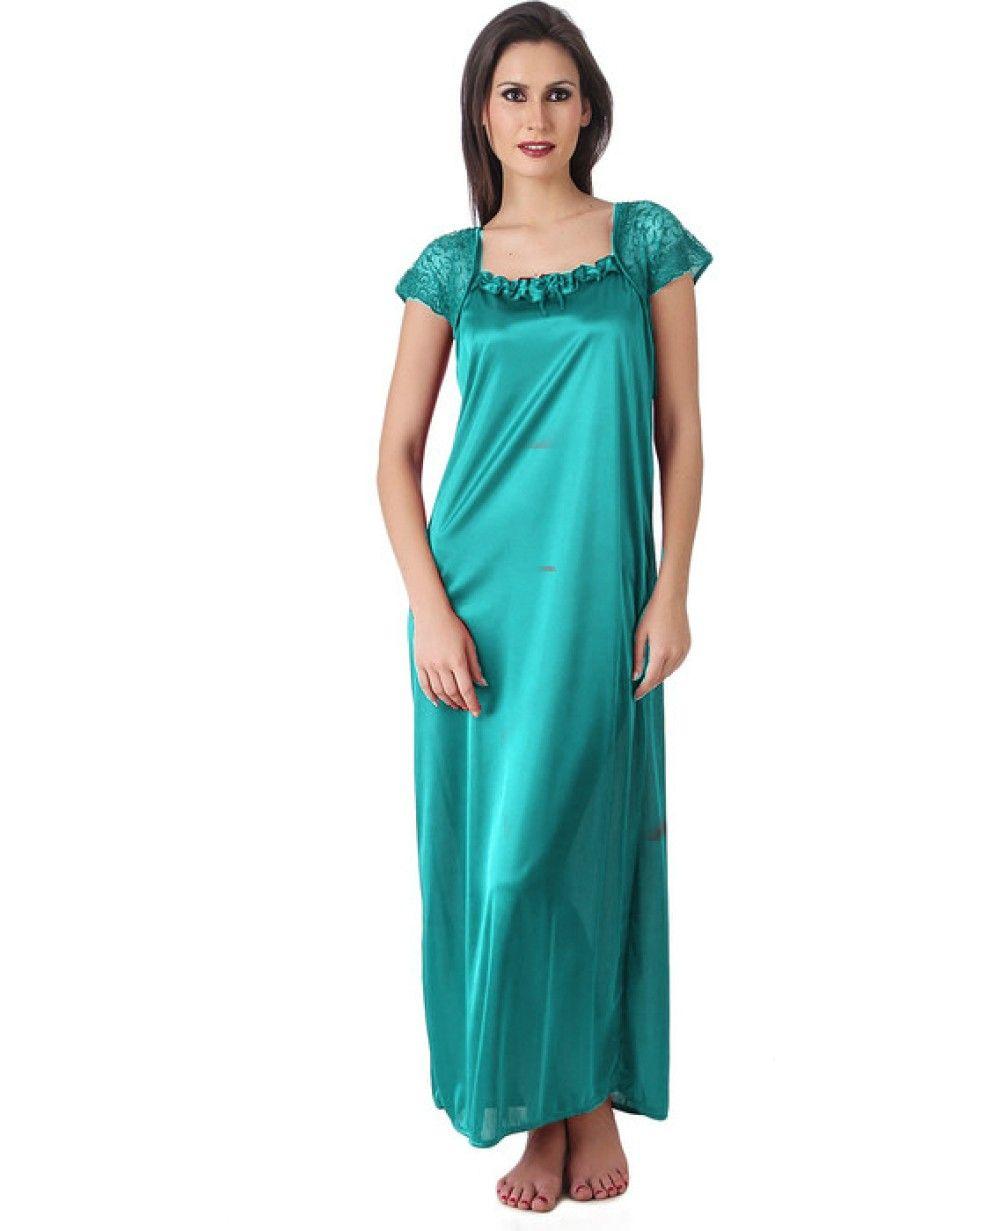 fefc8b20f6 Women Satin Turquoise Color One Piece Nighty